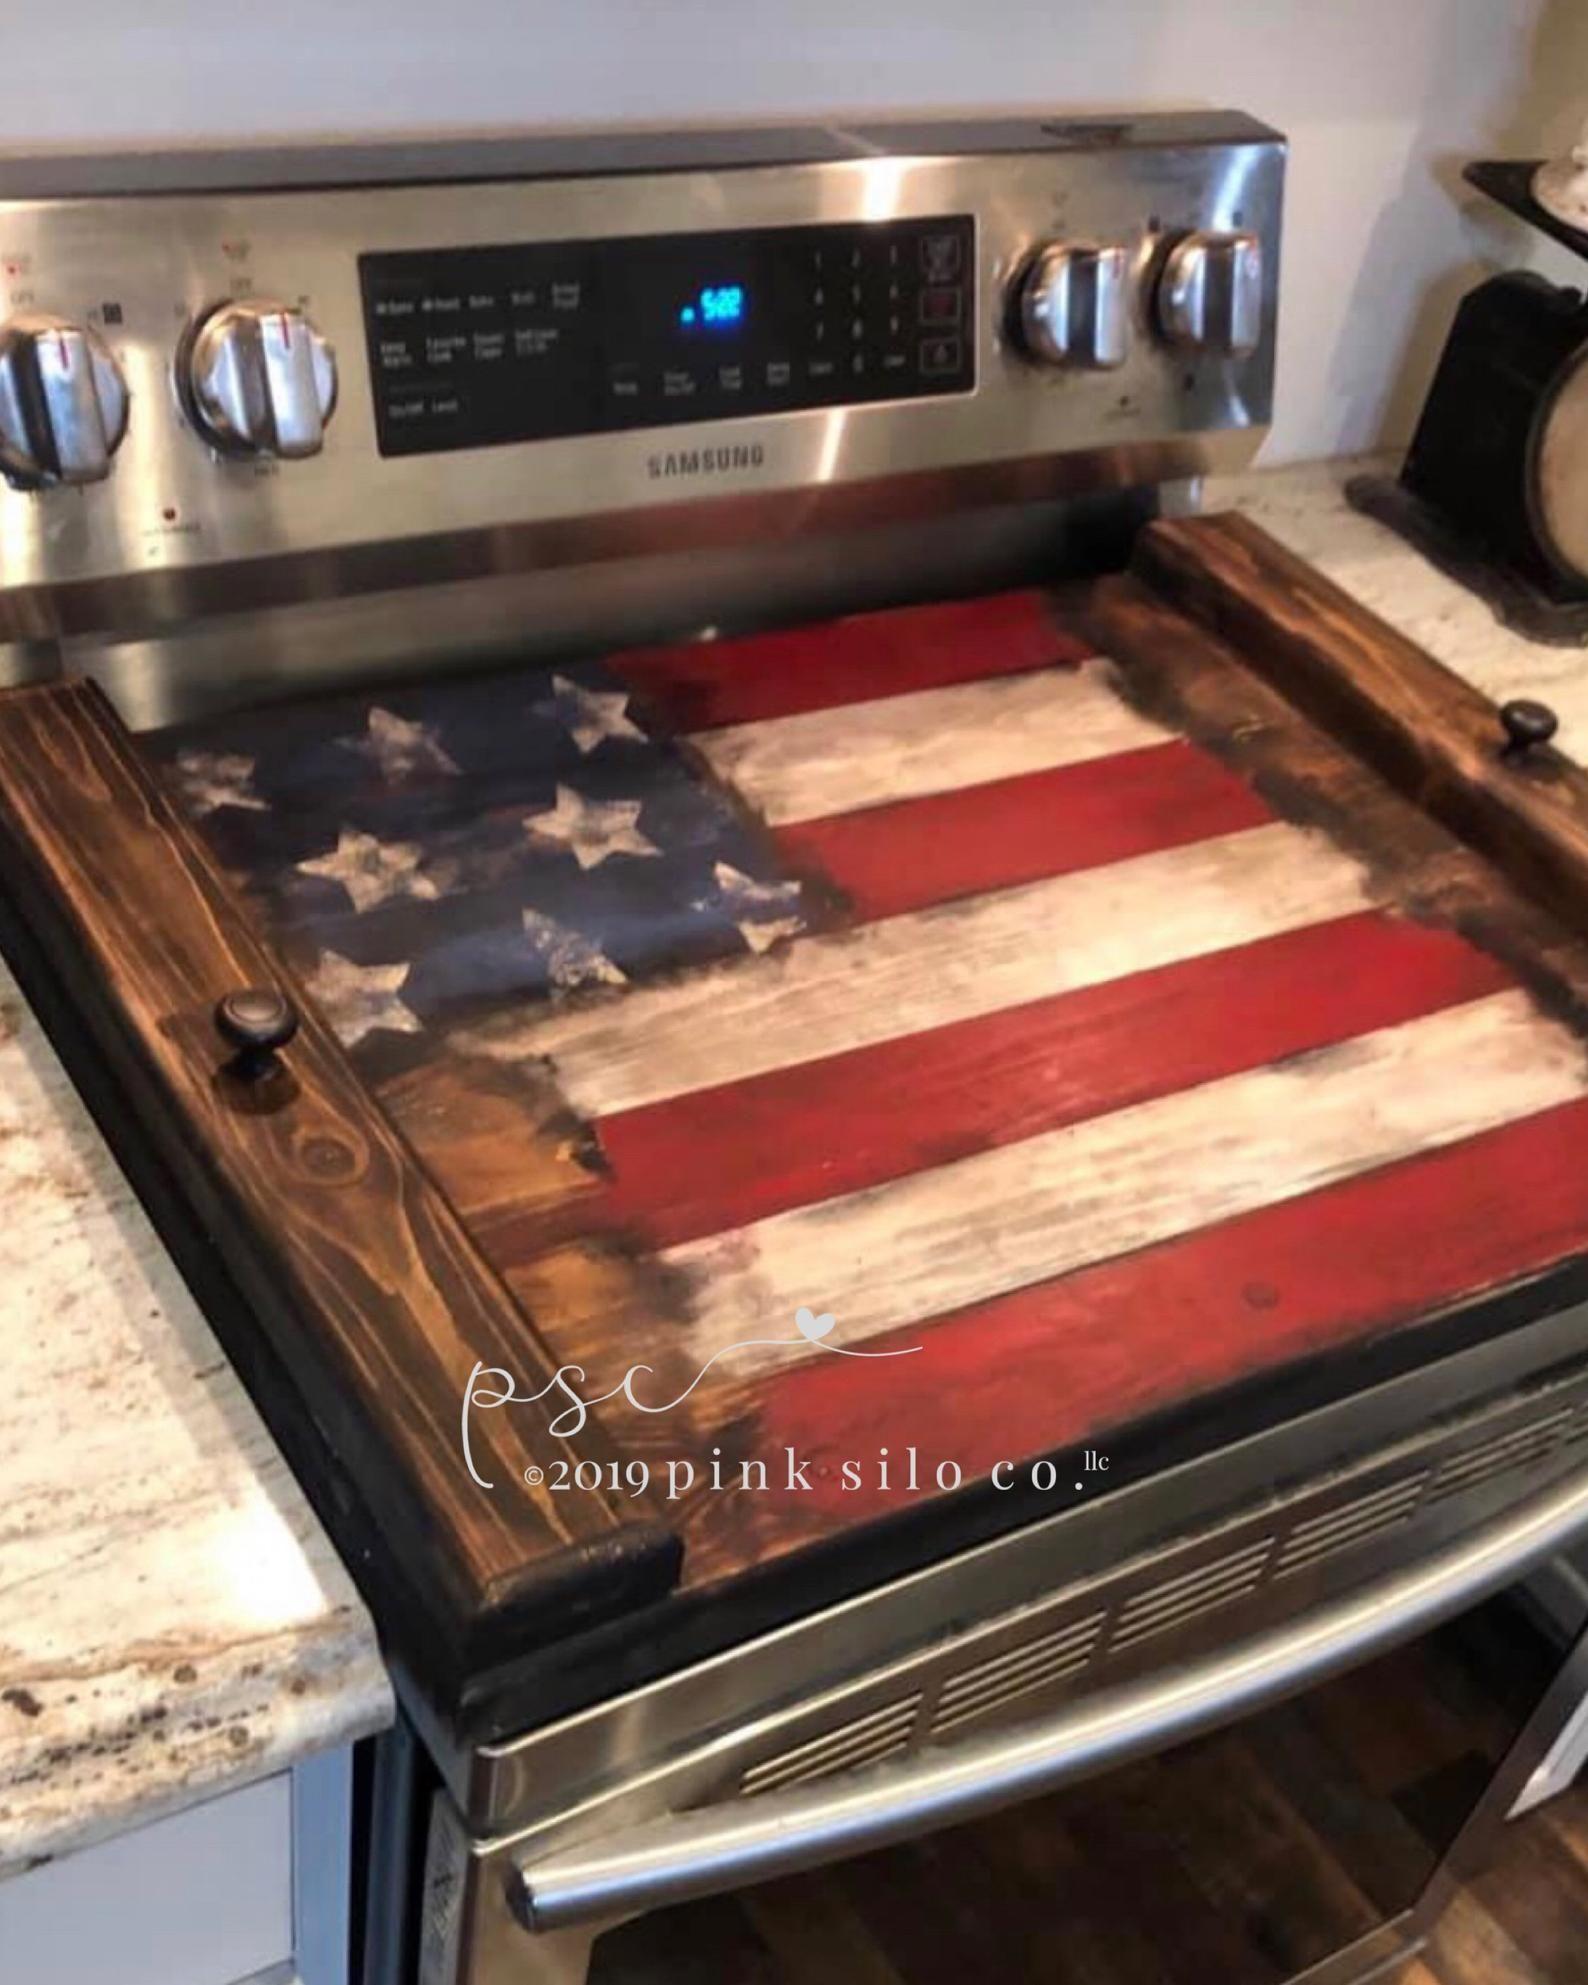 American Flag Noodle Board American Flag Stove Cover Rustic Americana Decor Rustic Stove Top Cover God Bless America Sign Noodle Board Stove Top Cover Stove Cover